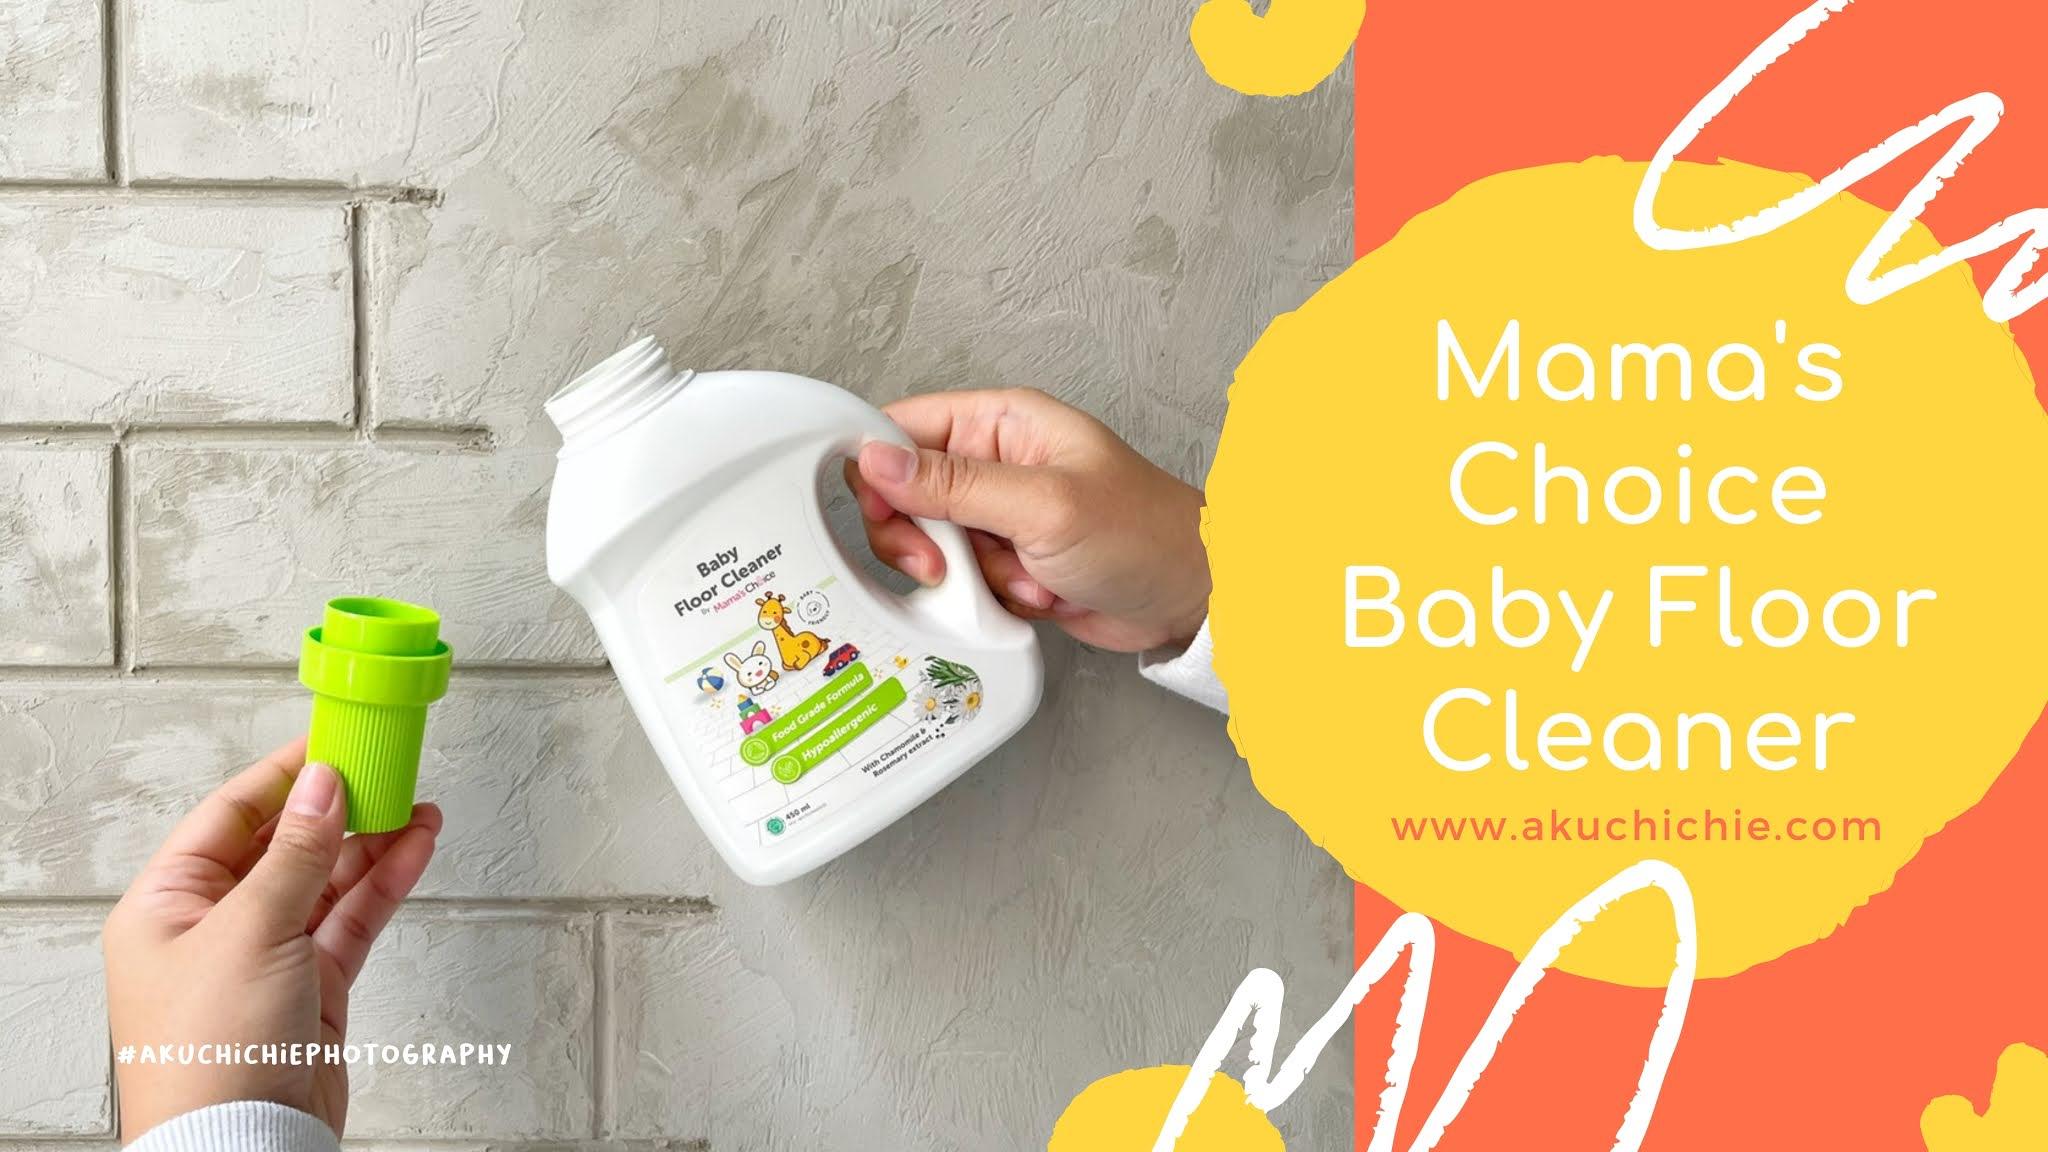 mama's choice baby floor cleaner